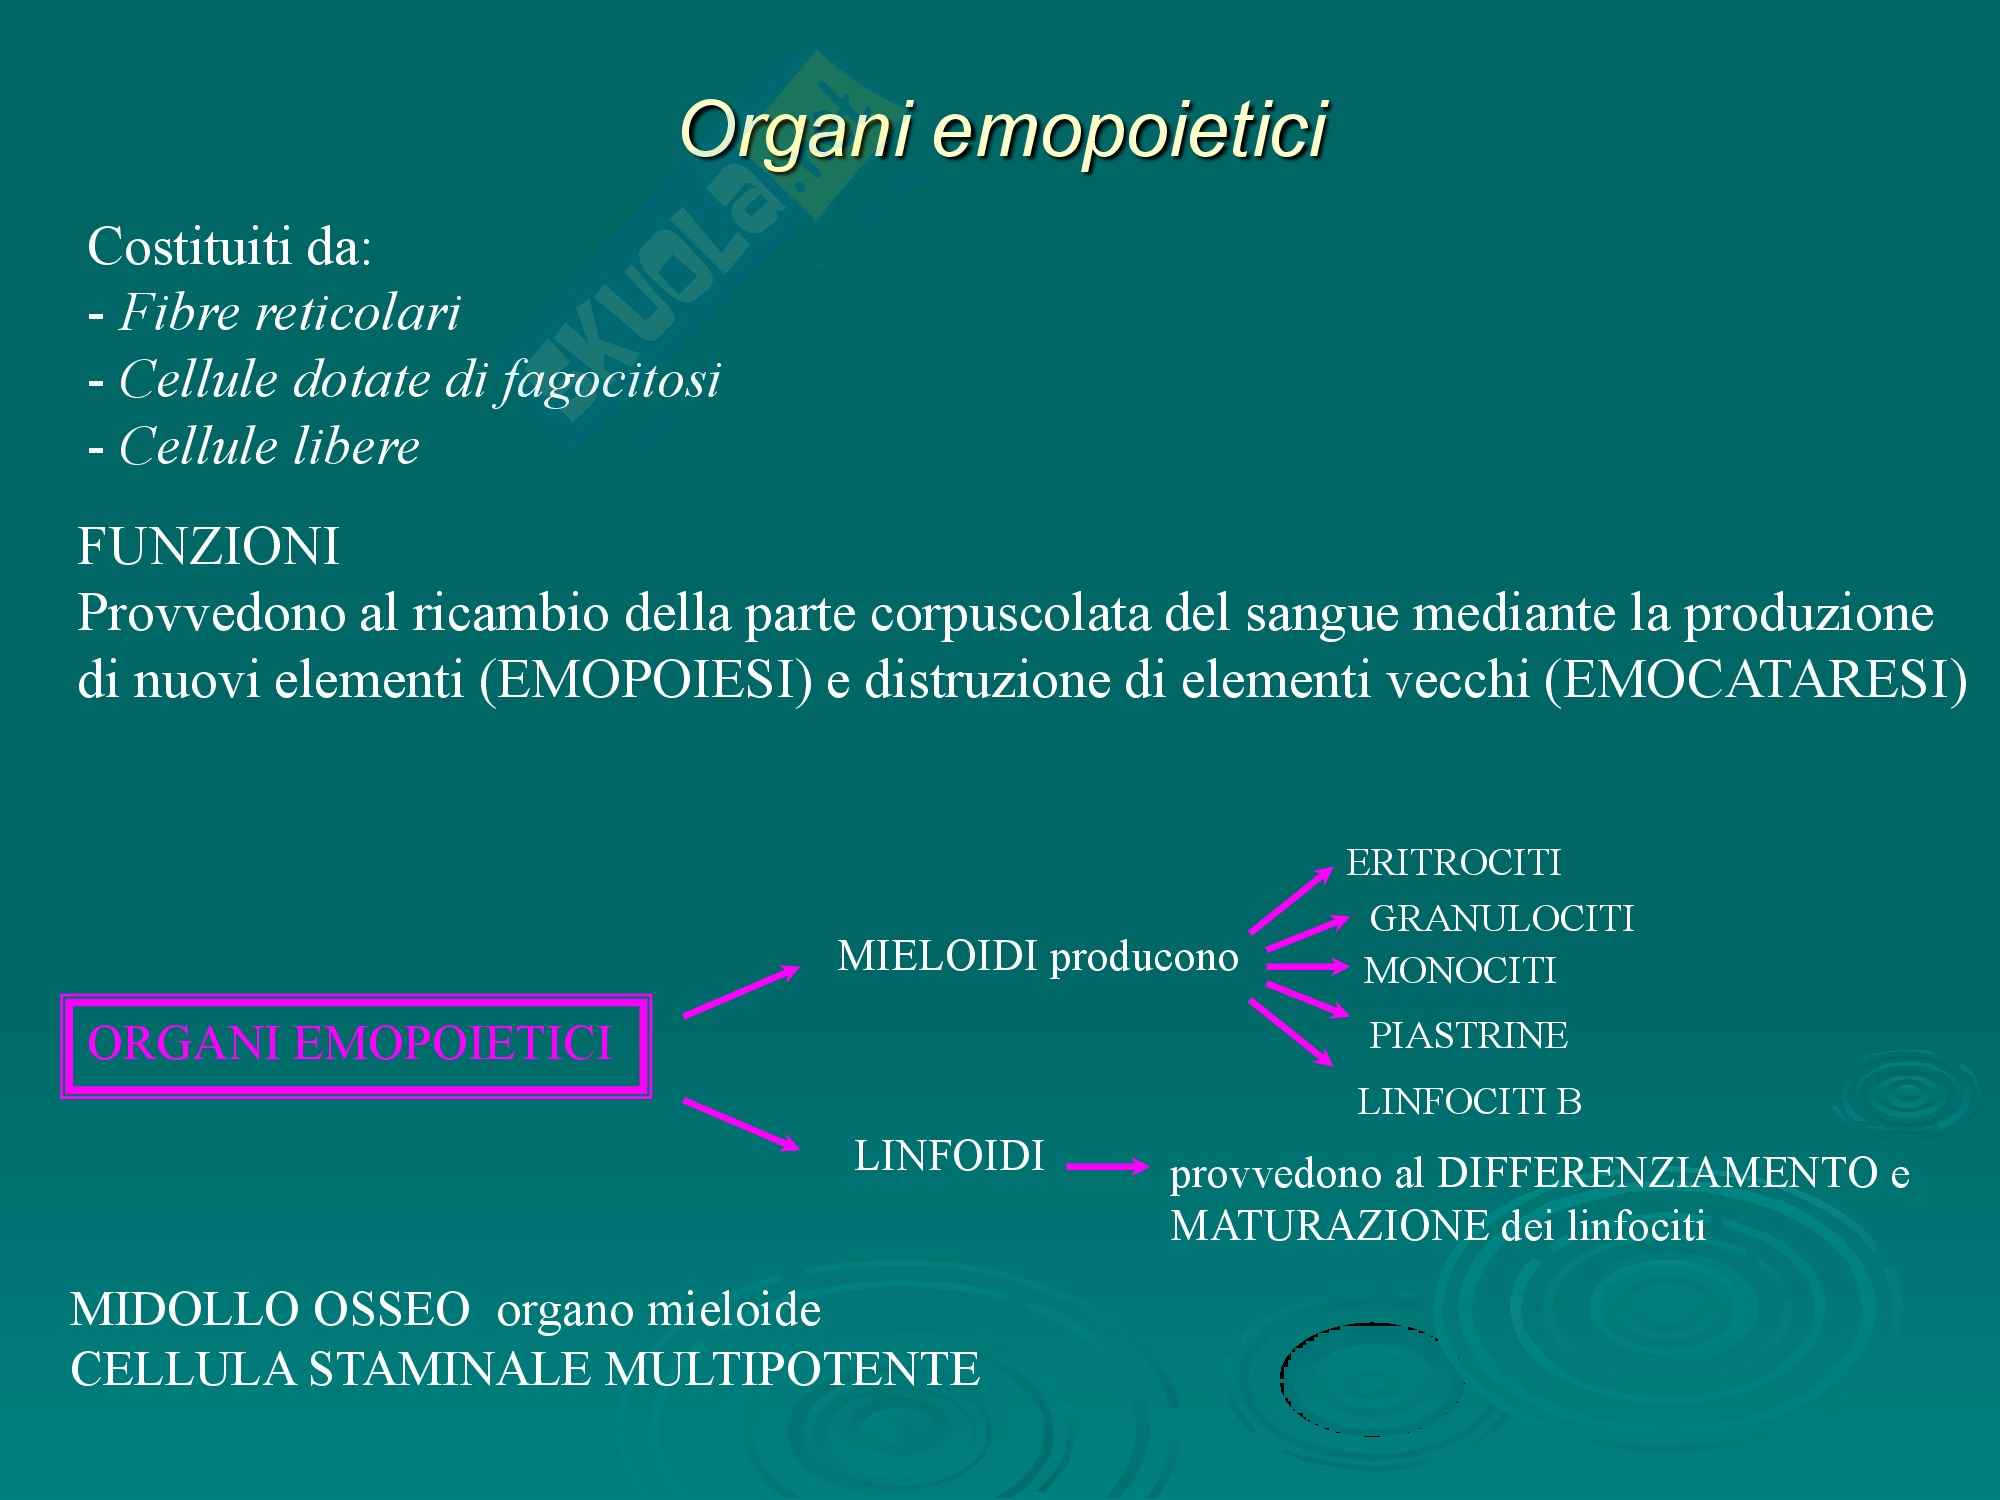 Organi Emopoietici